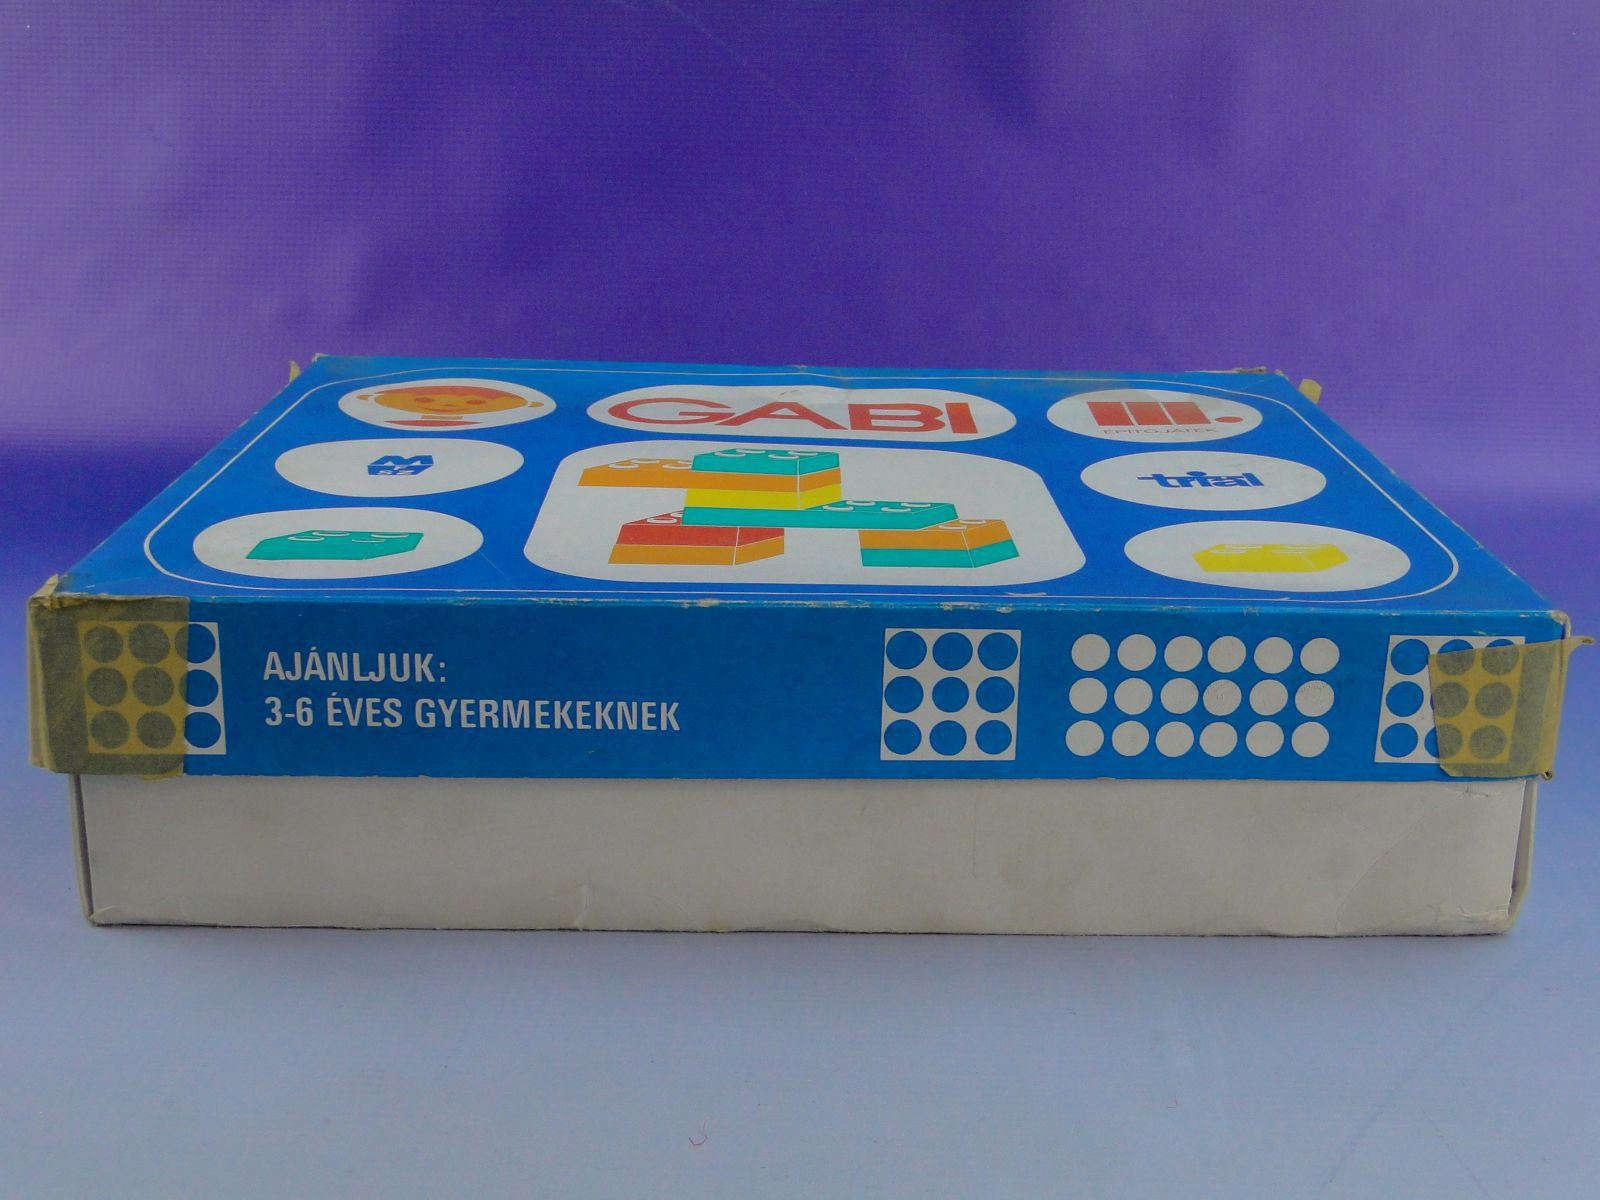 DSC03310.JPG (1600�1200)